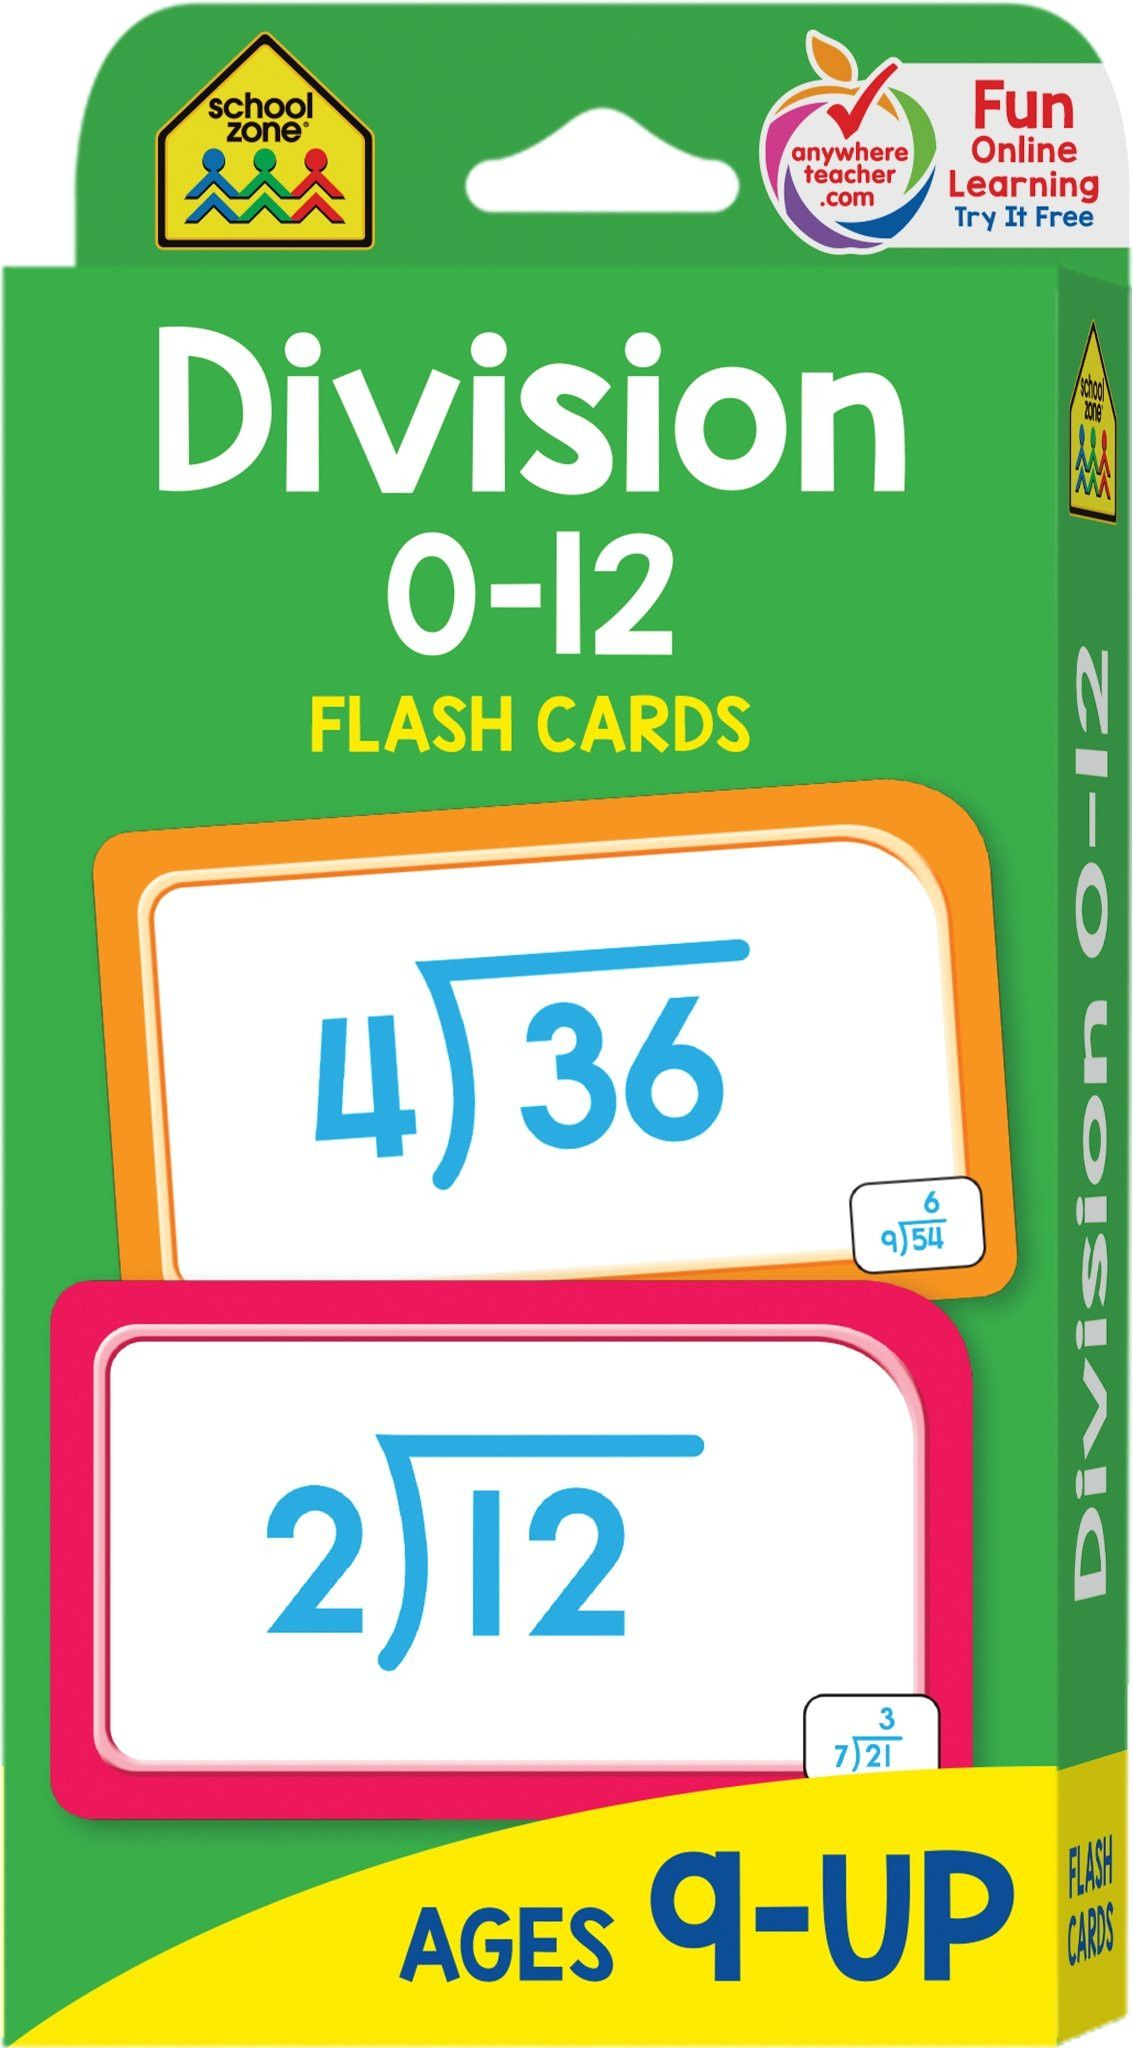 5 Free Flashcards Math Addition School Zone Division 0 12